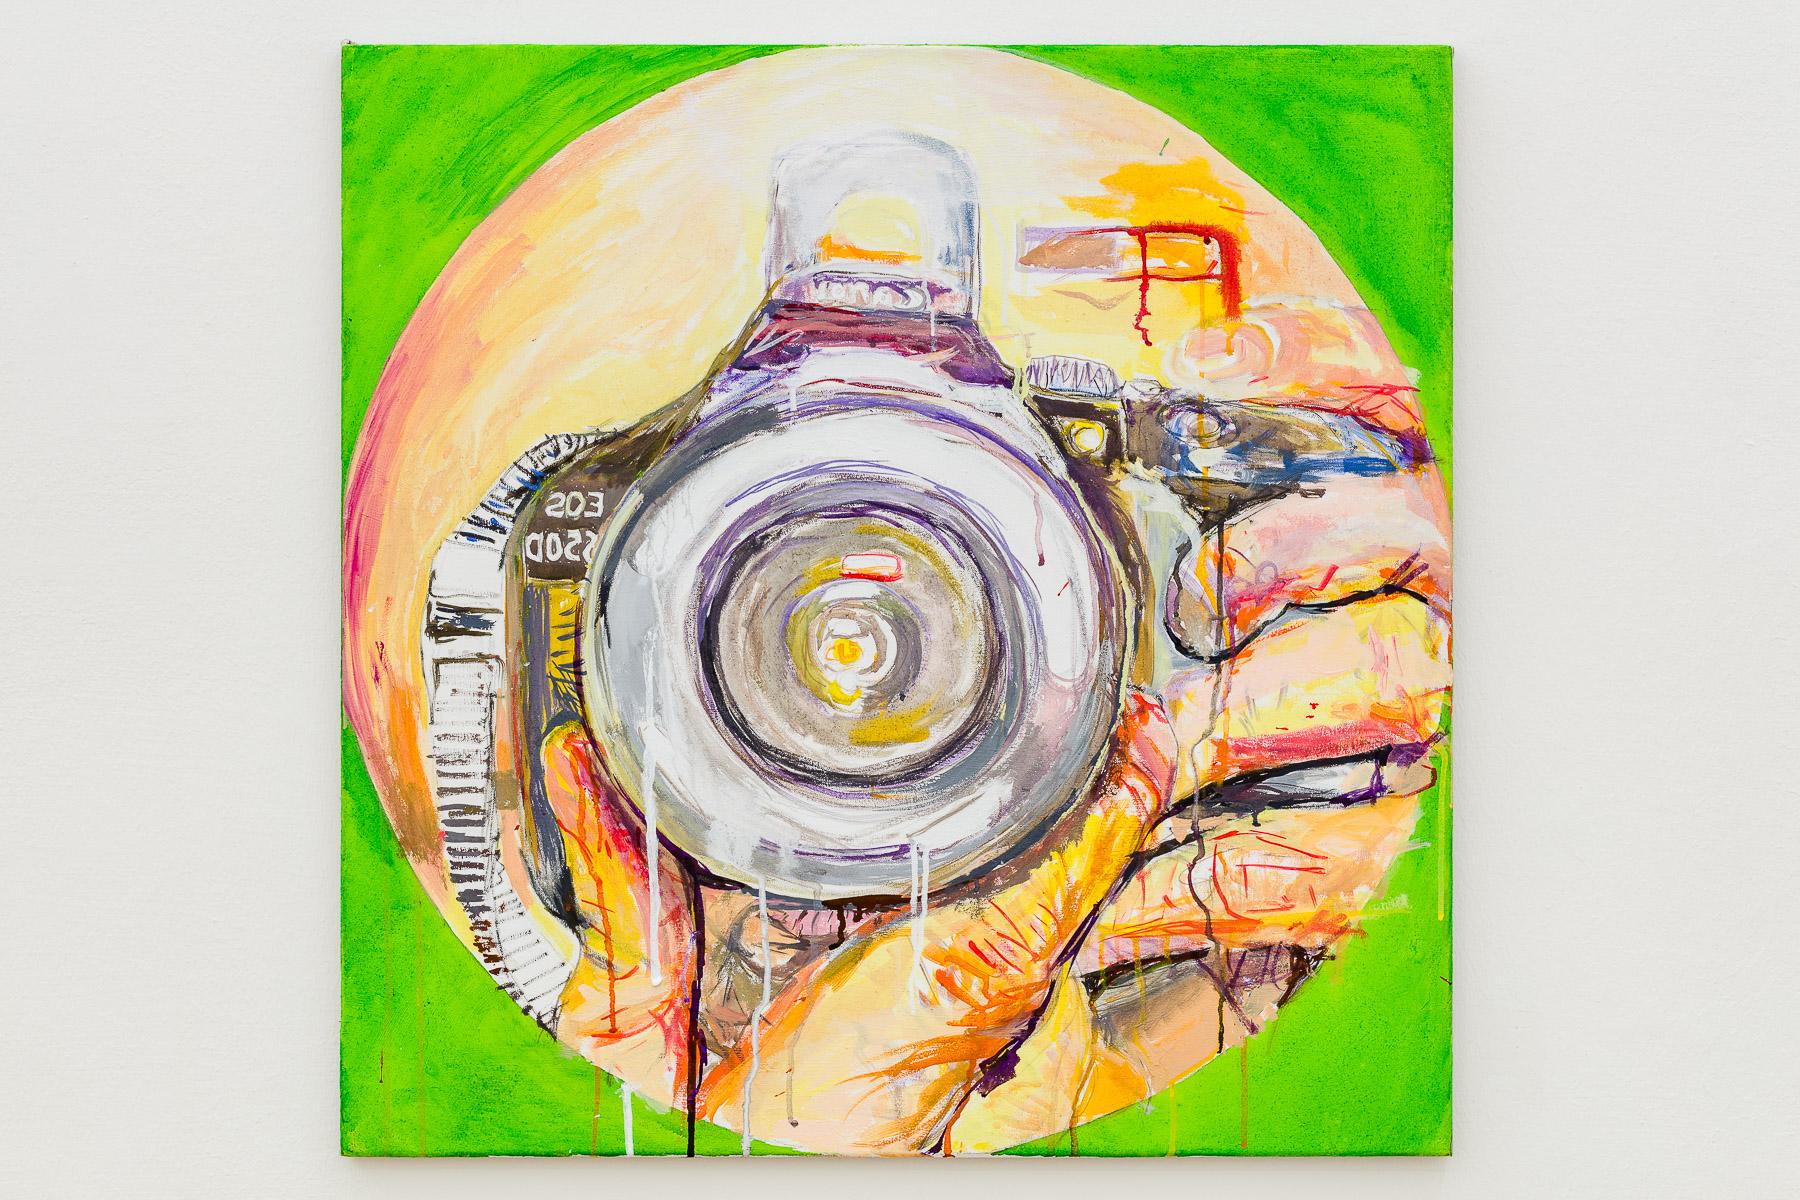 2019_05_20_Elke-Krystufek_Croy-Nielsen_by-kunst-dokumentation-com_026_web.jpg